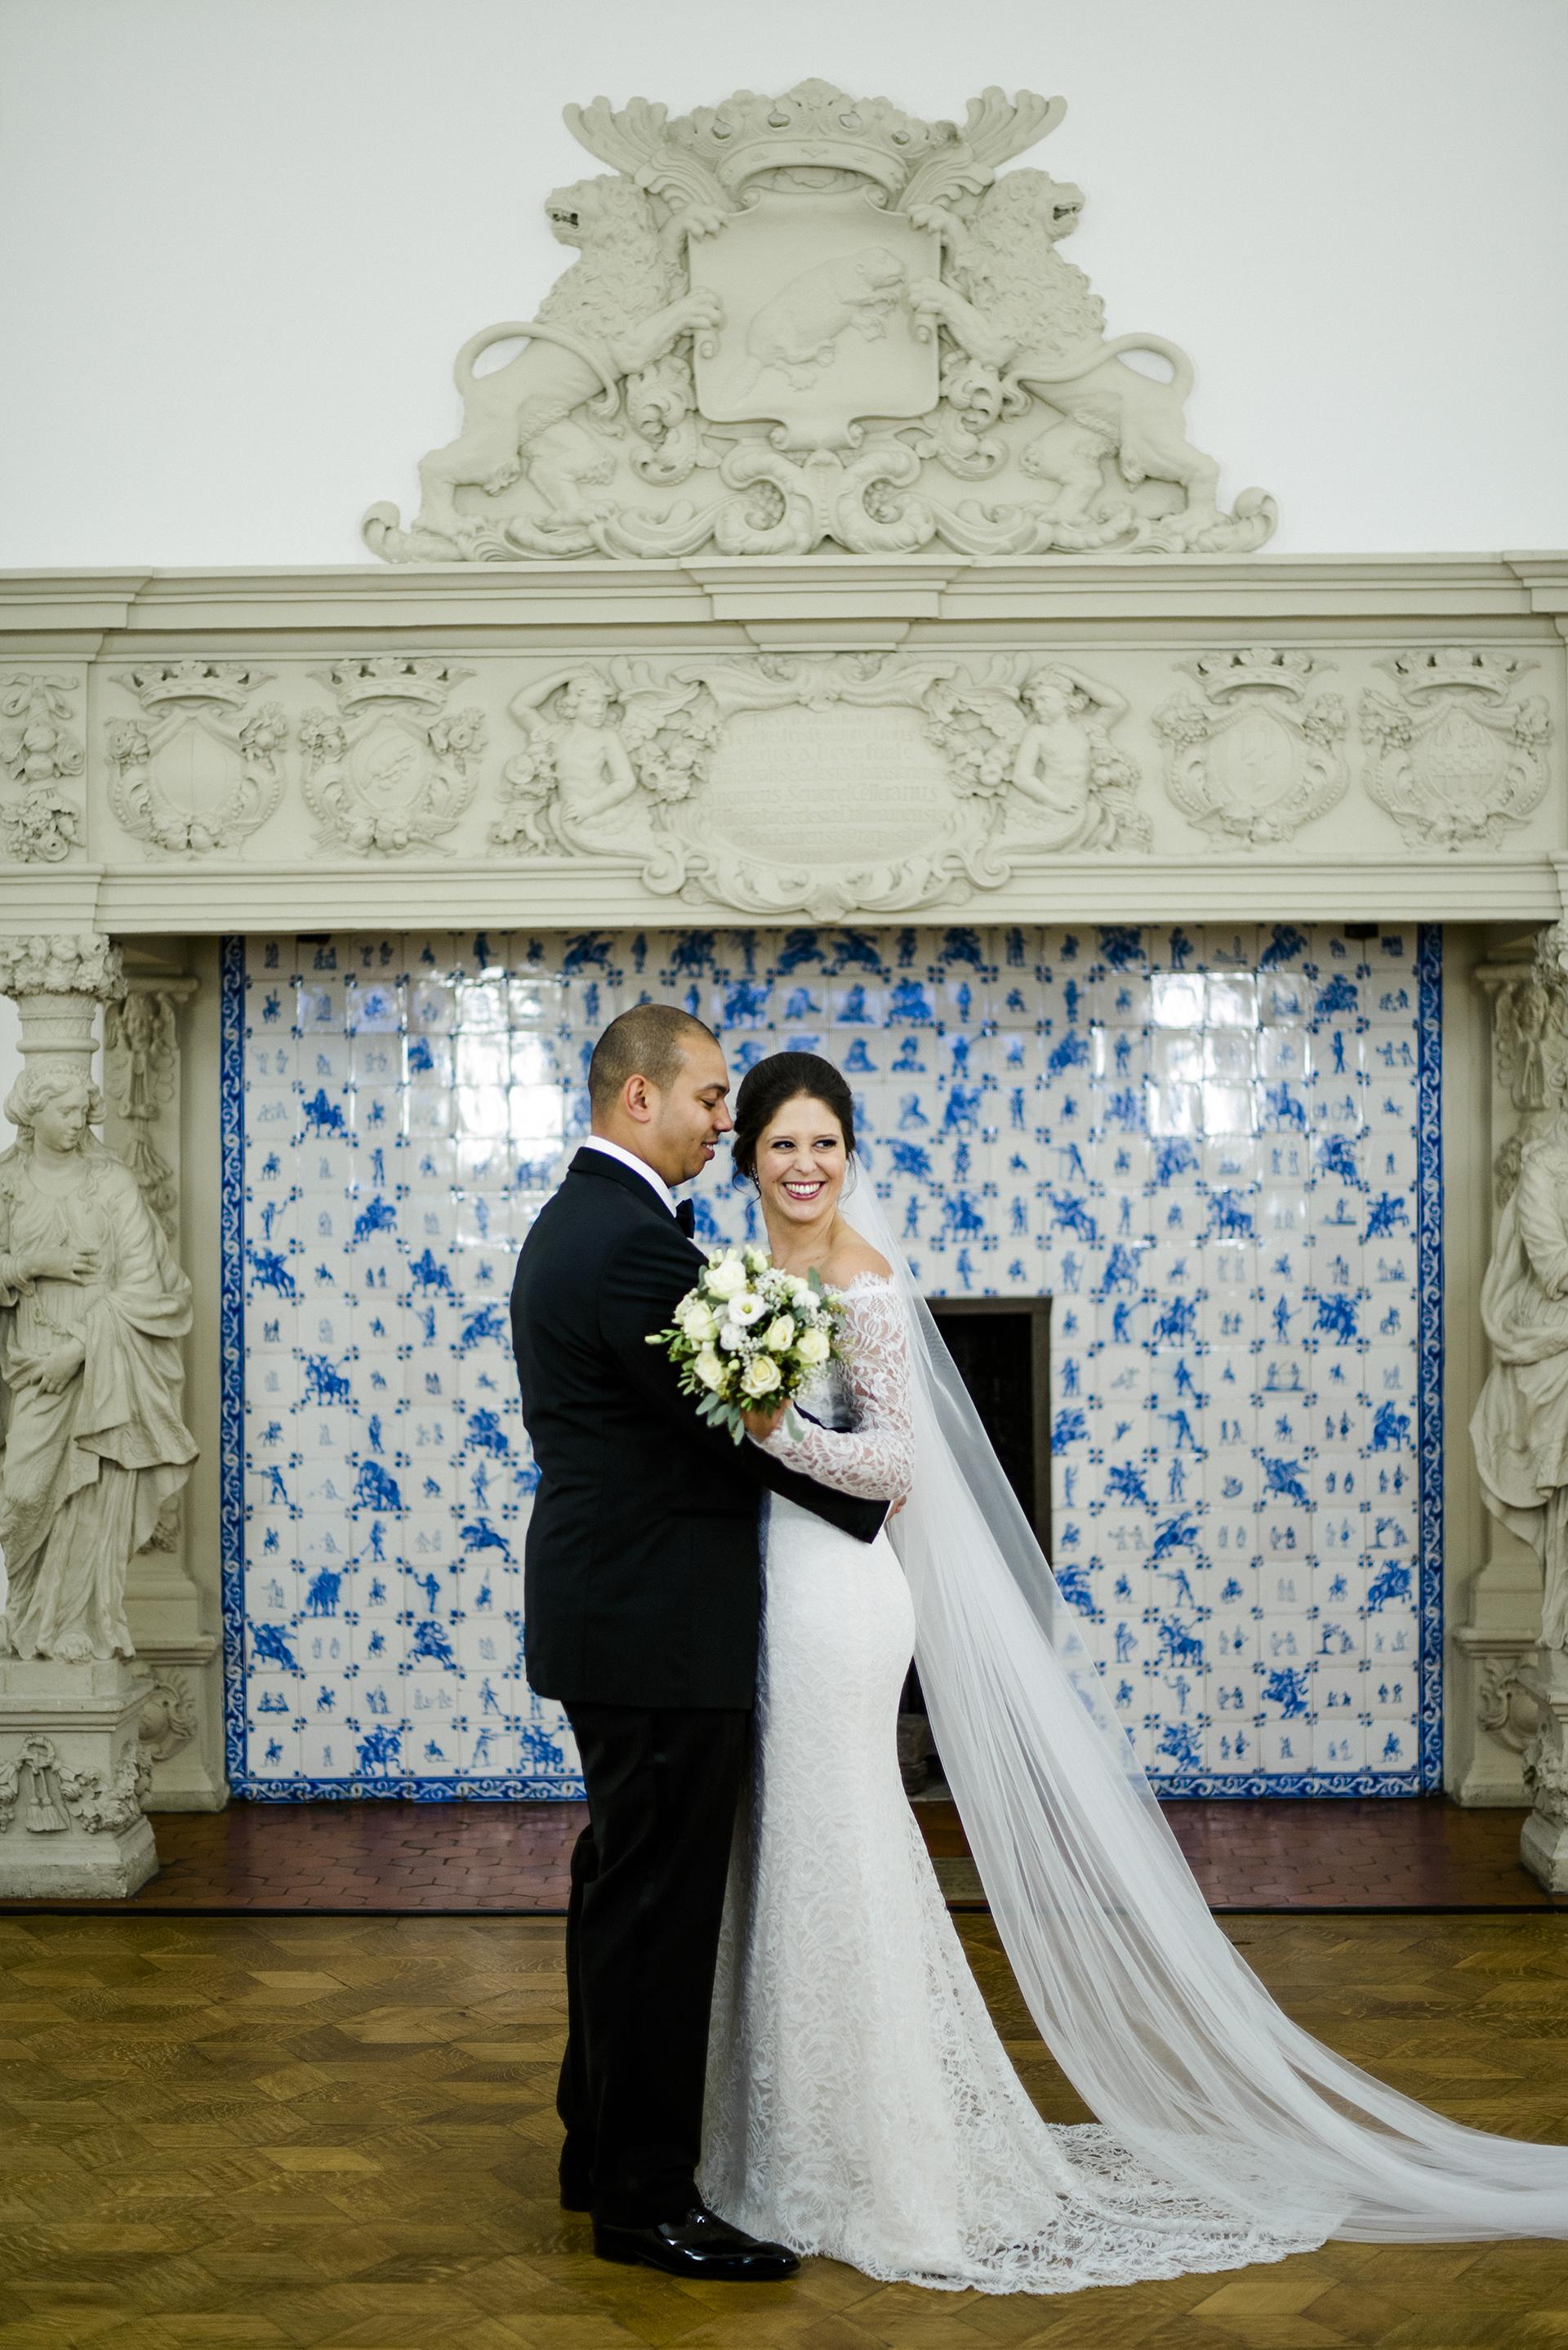 Hochzeitsreportage_J&D_046_Caroline Queda Fotografie